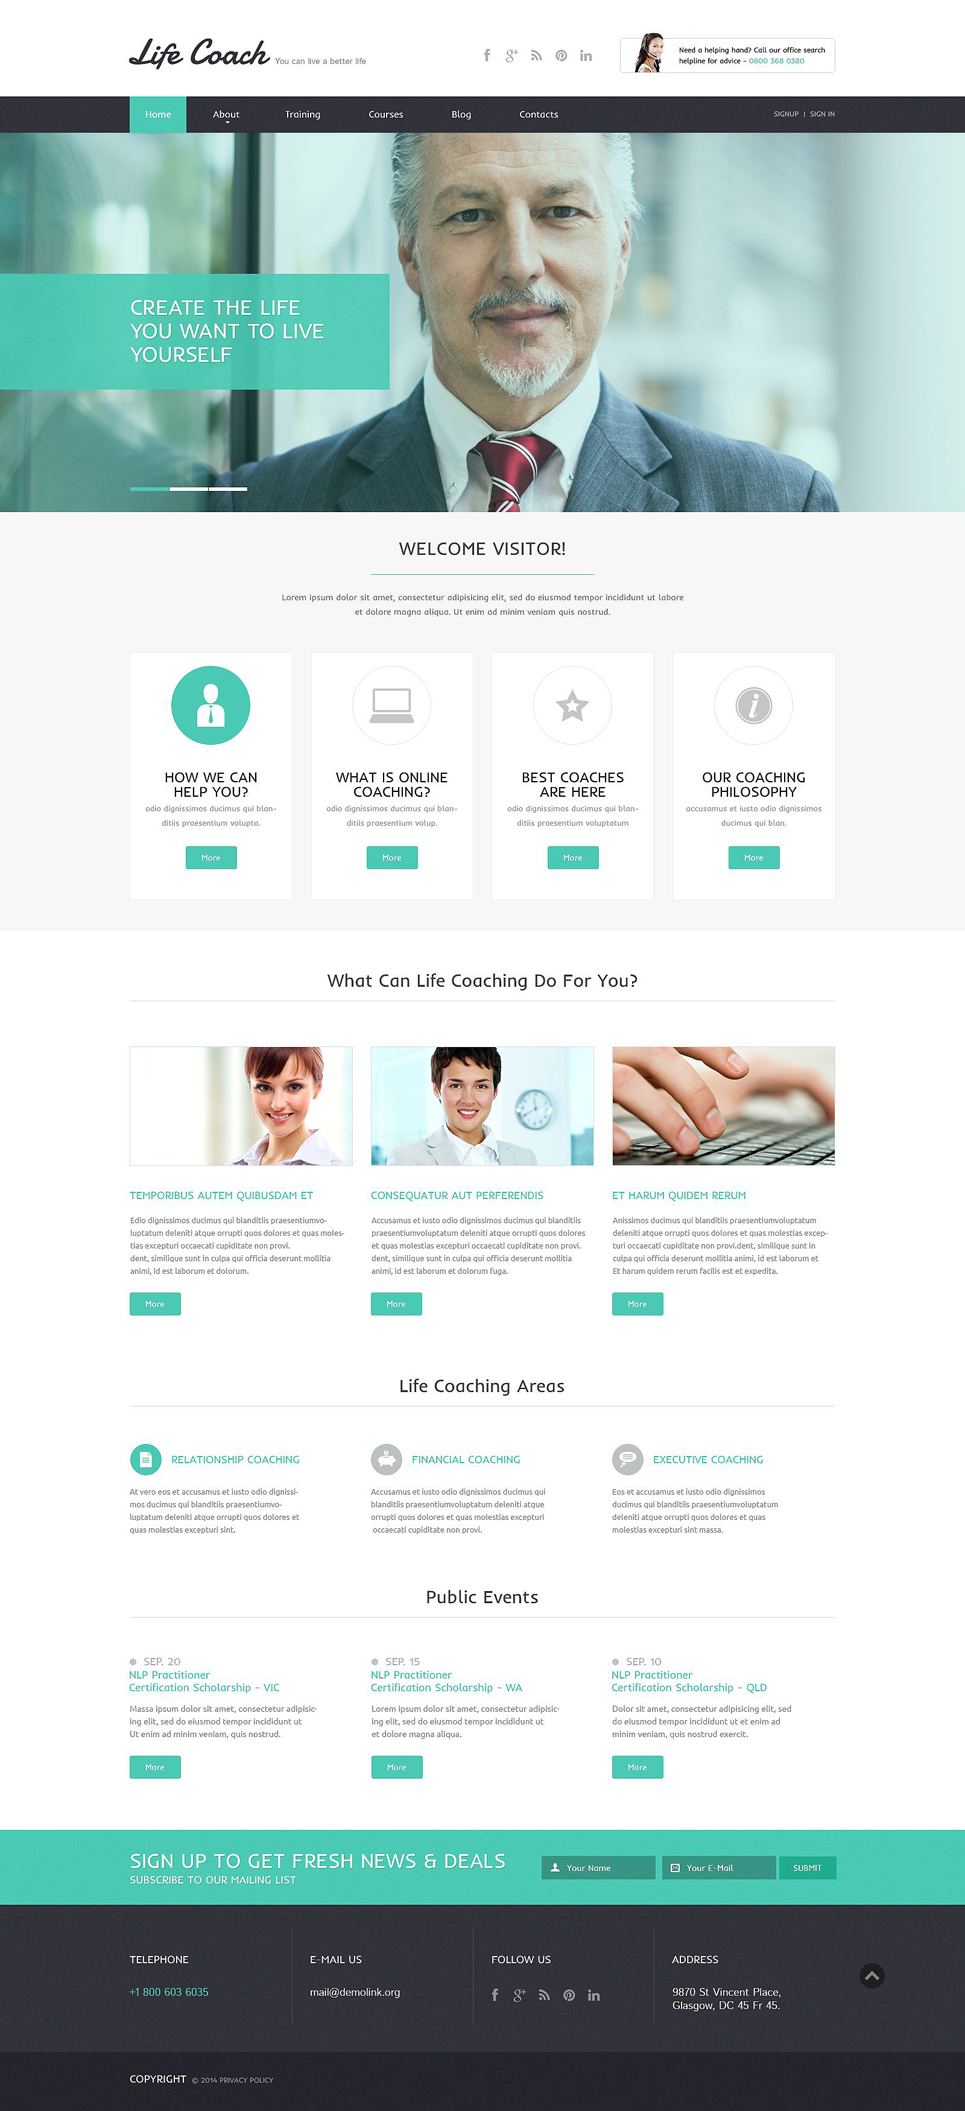 life coach responsive website template 51743. Black Bedroom Furniture Sets. Home Design Ideas